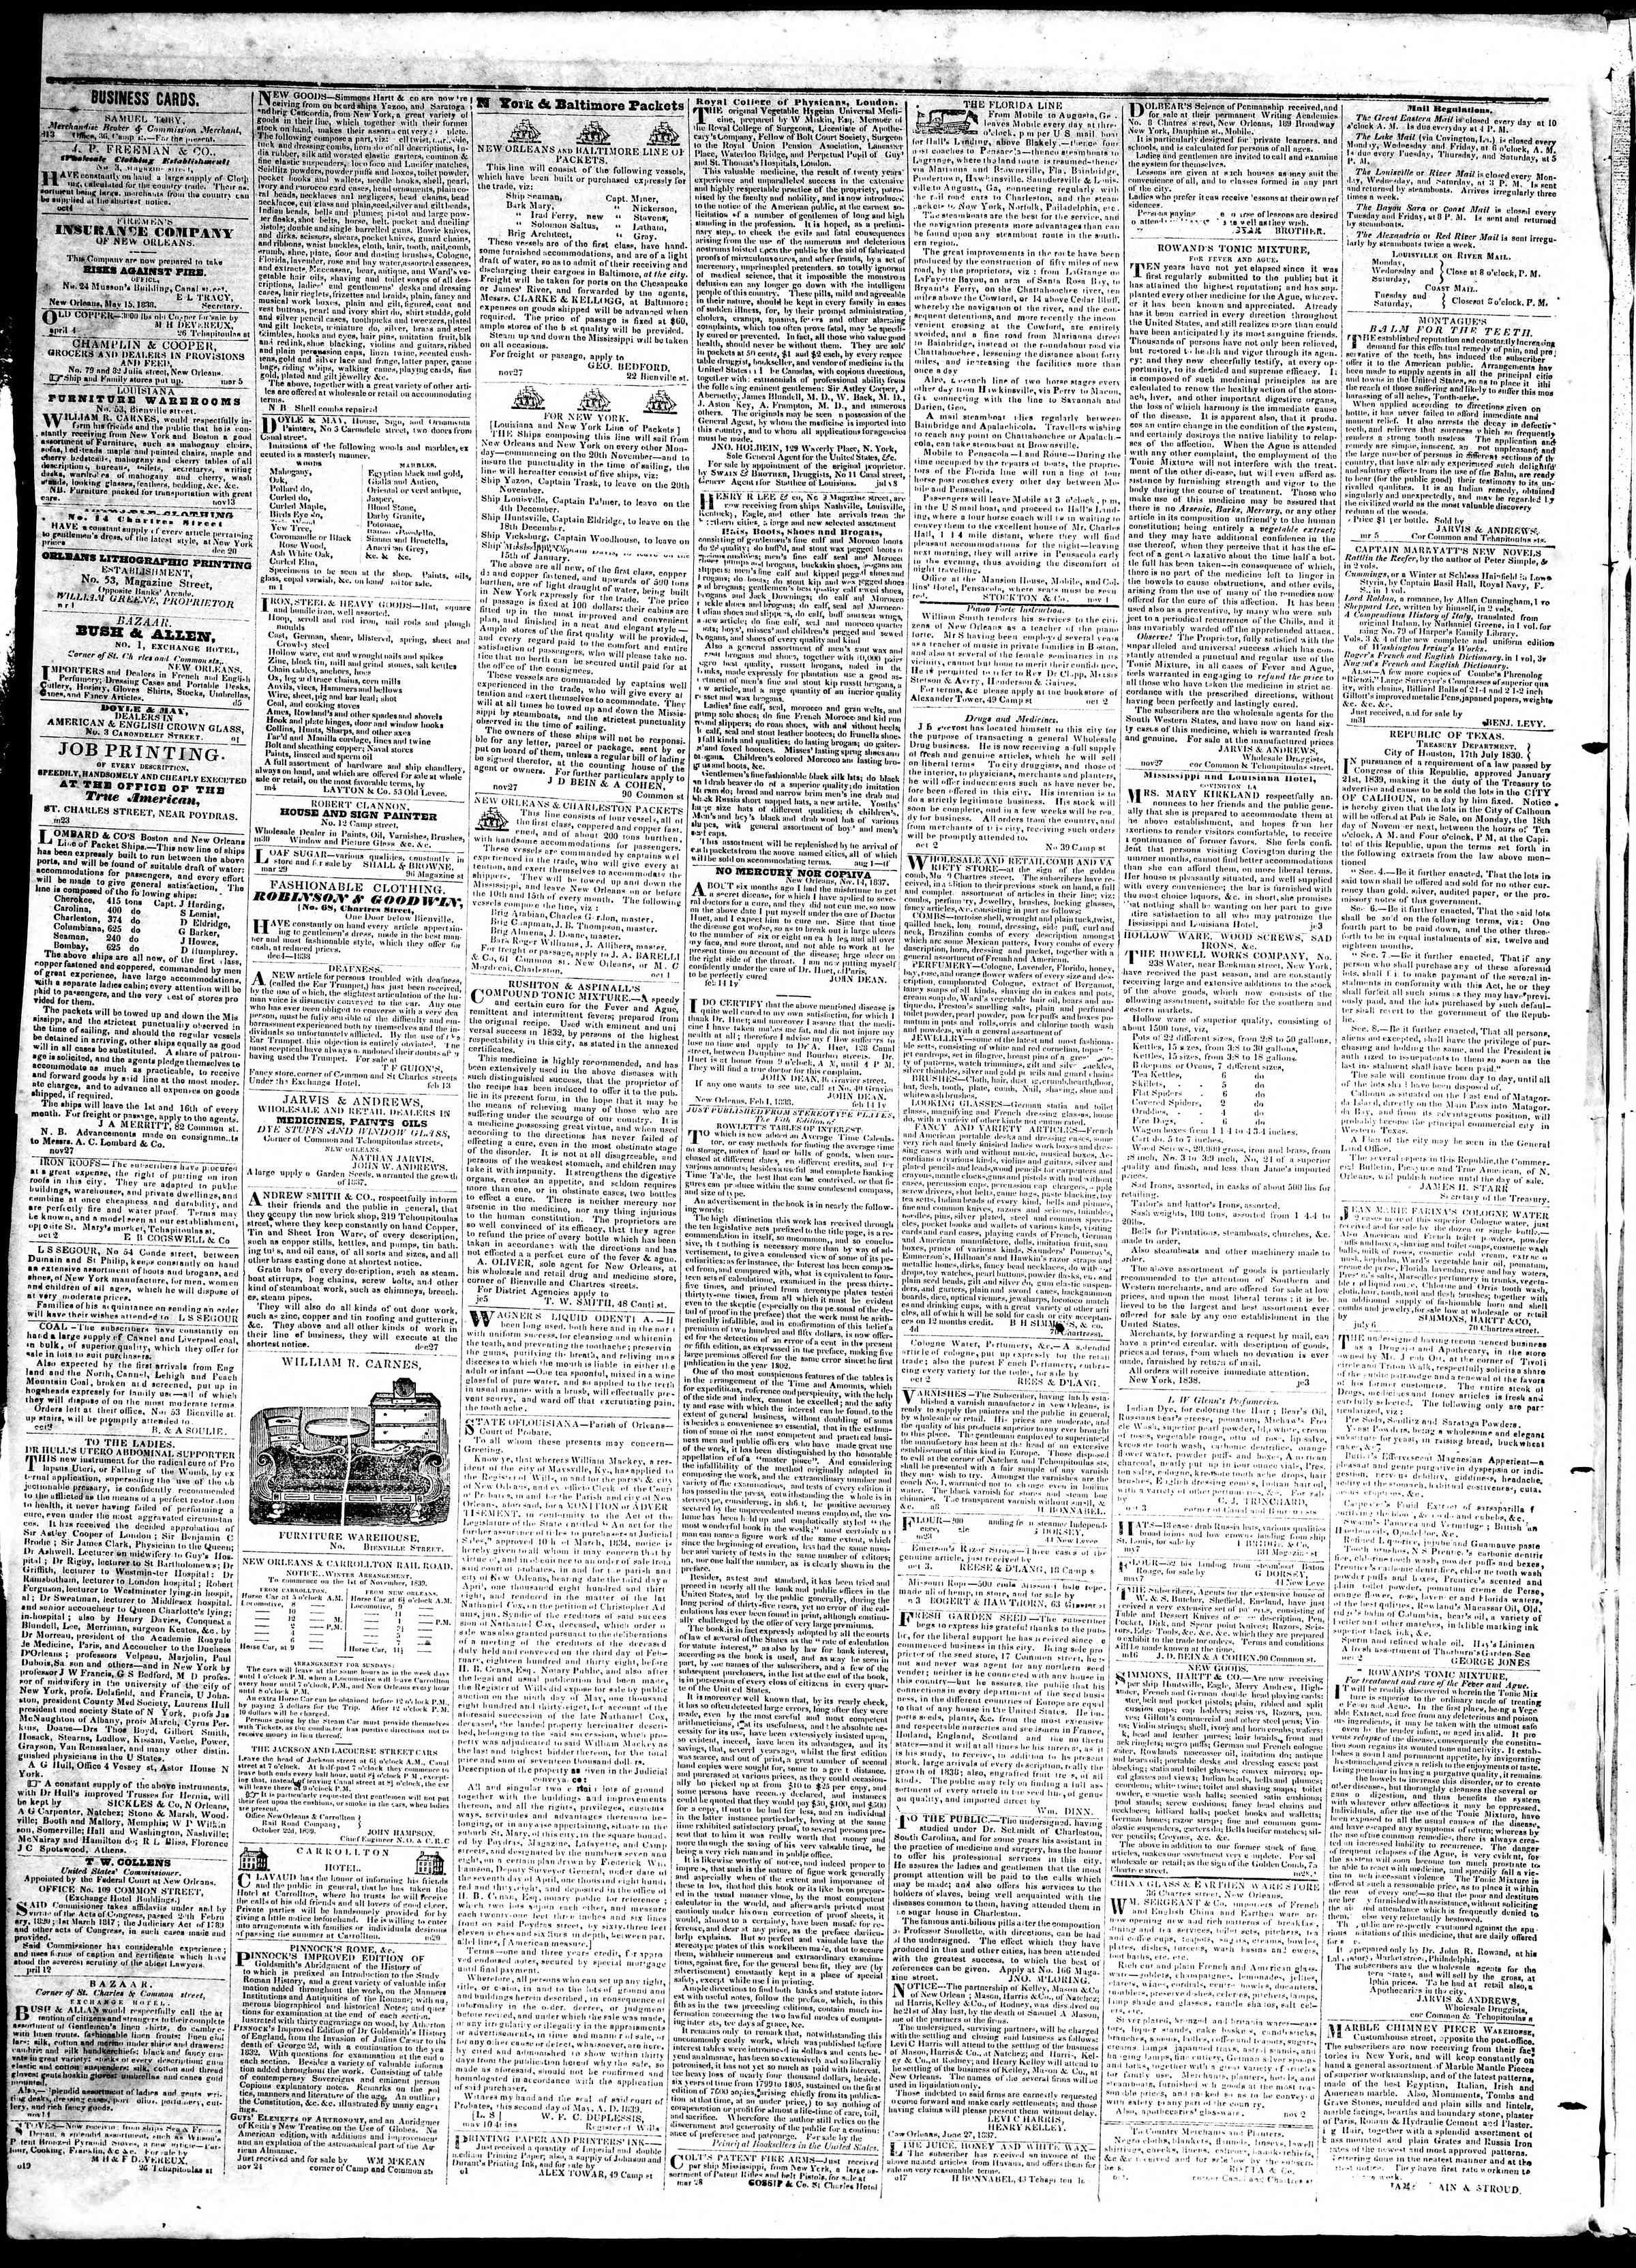 November 21, 1839 Tarihli True American Gazetesi Sayfa 4